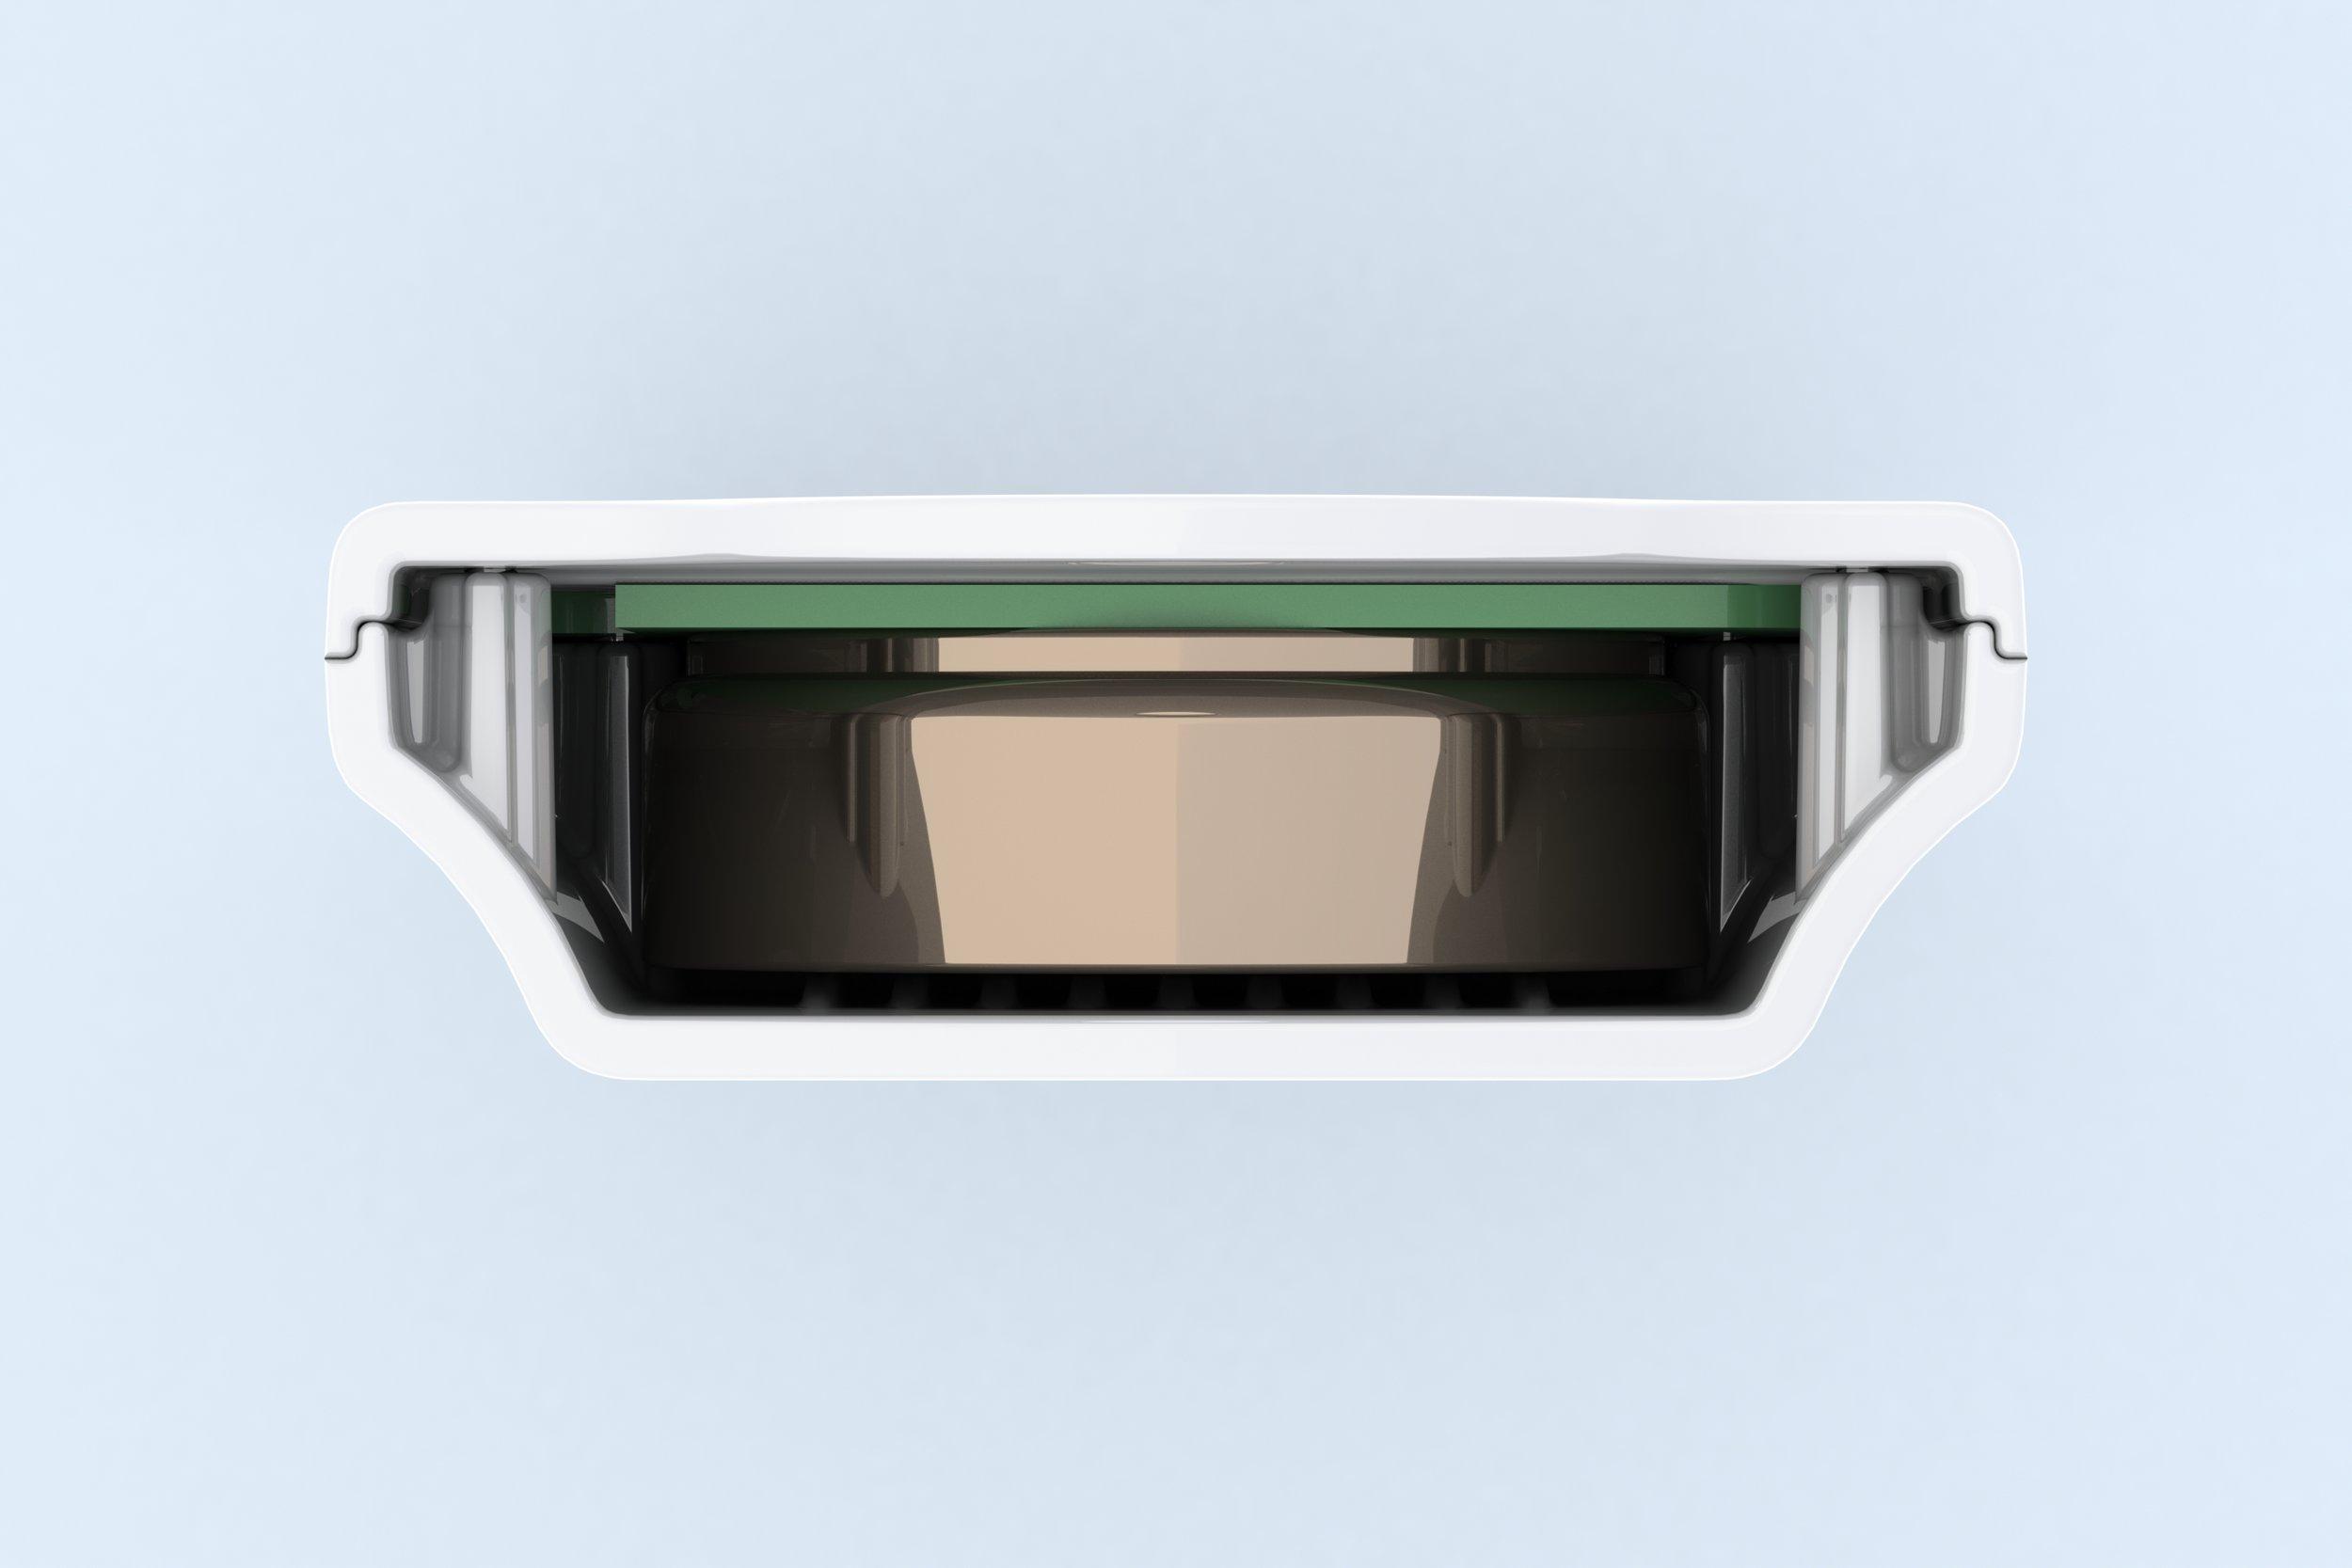 Badge - Top View No Battery Glide - Render.JPG